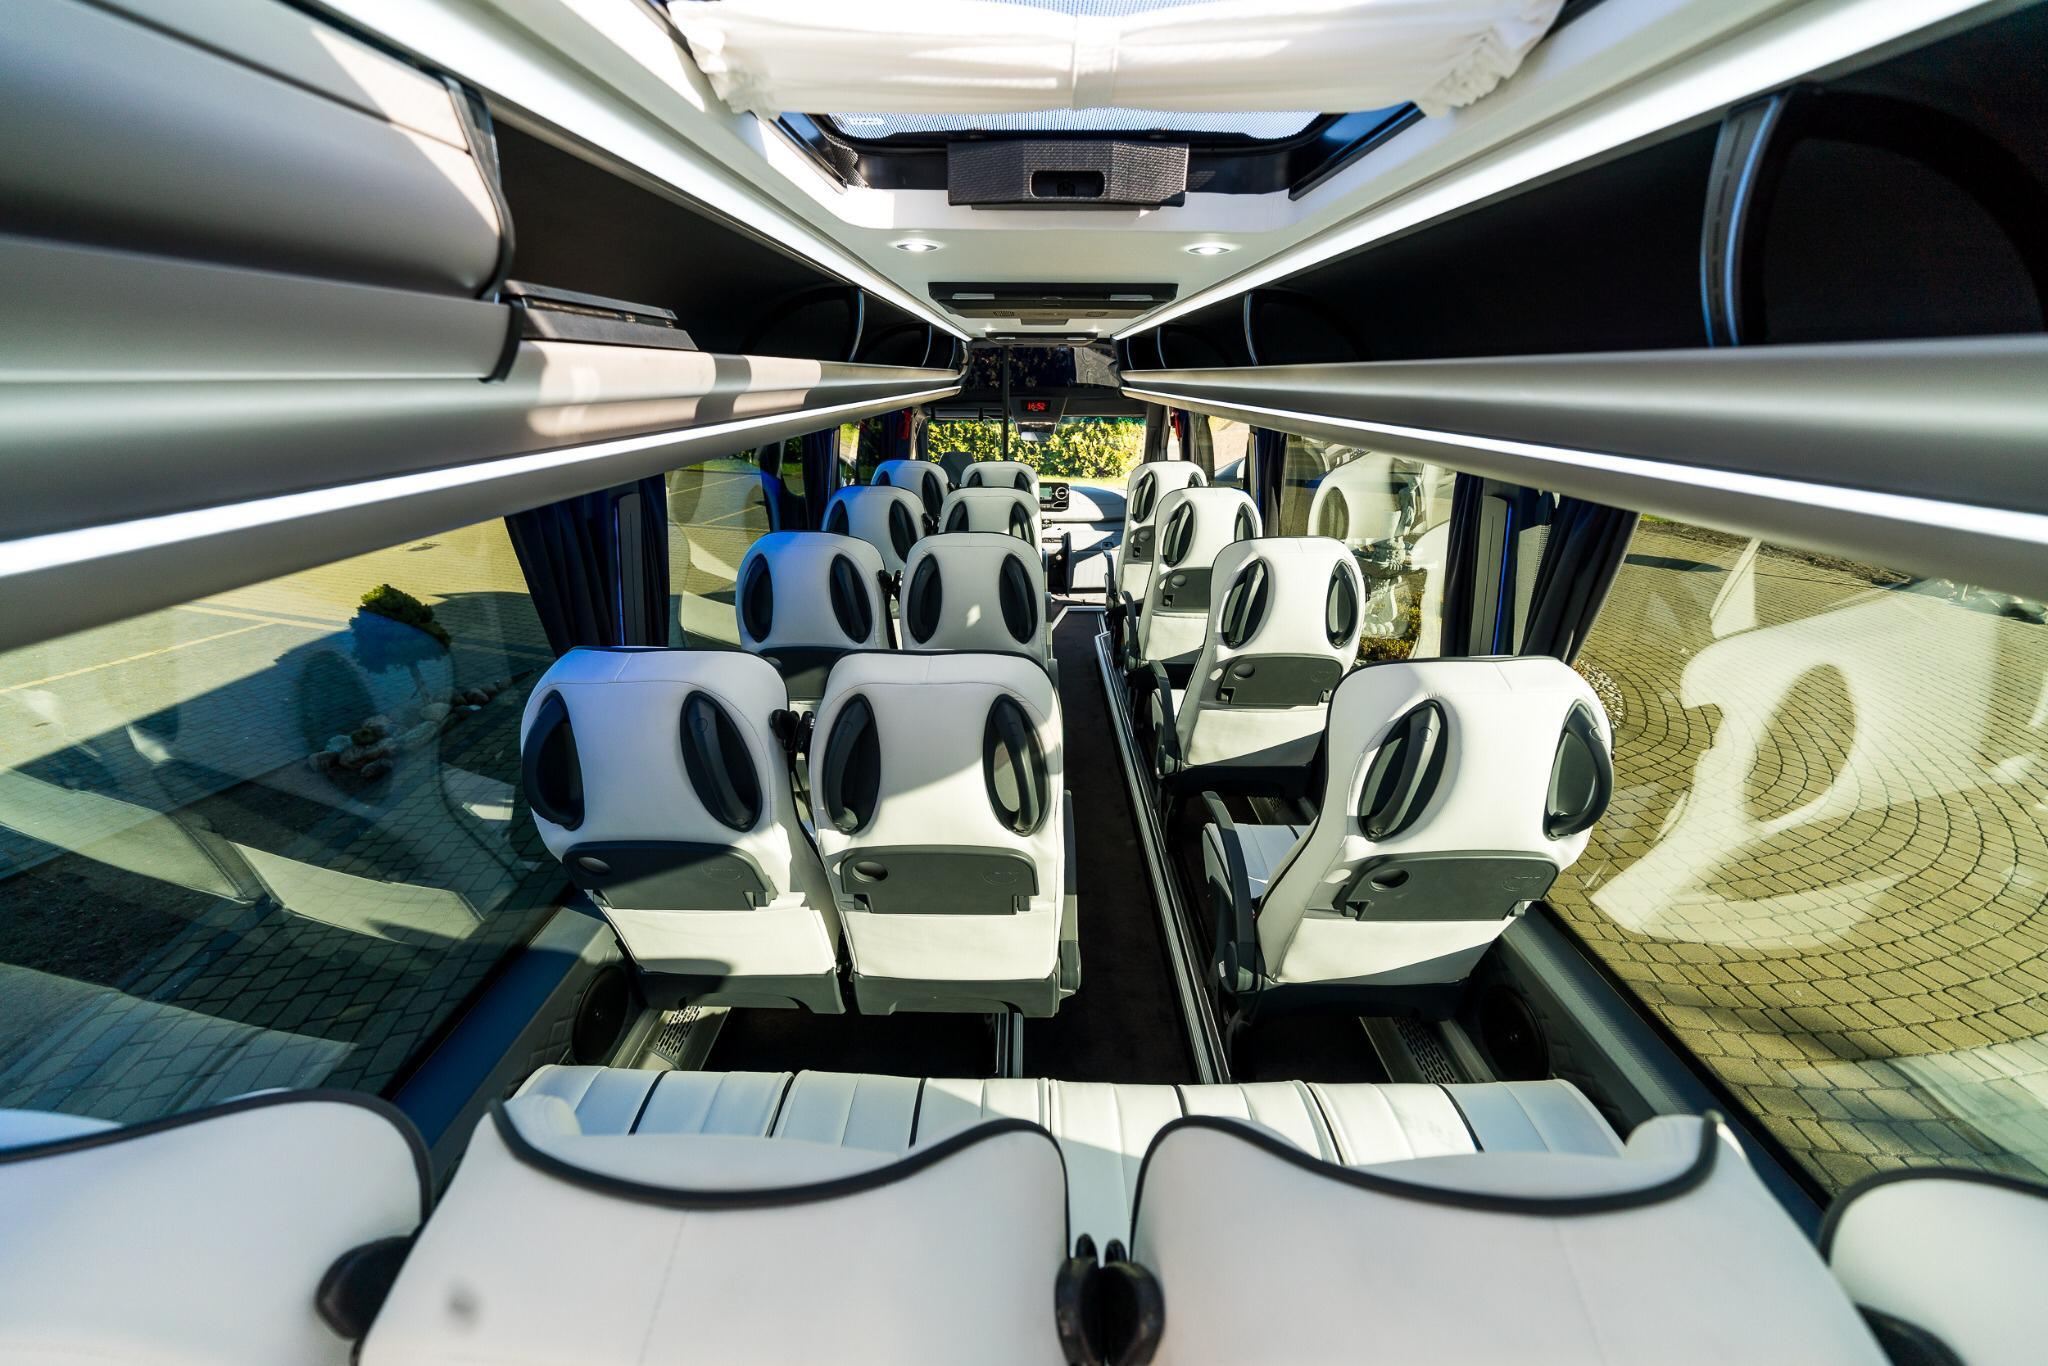 inside picture vip sprinter minibus white leather seats